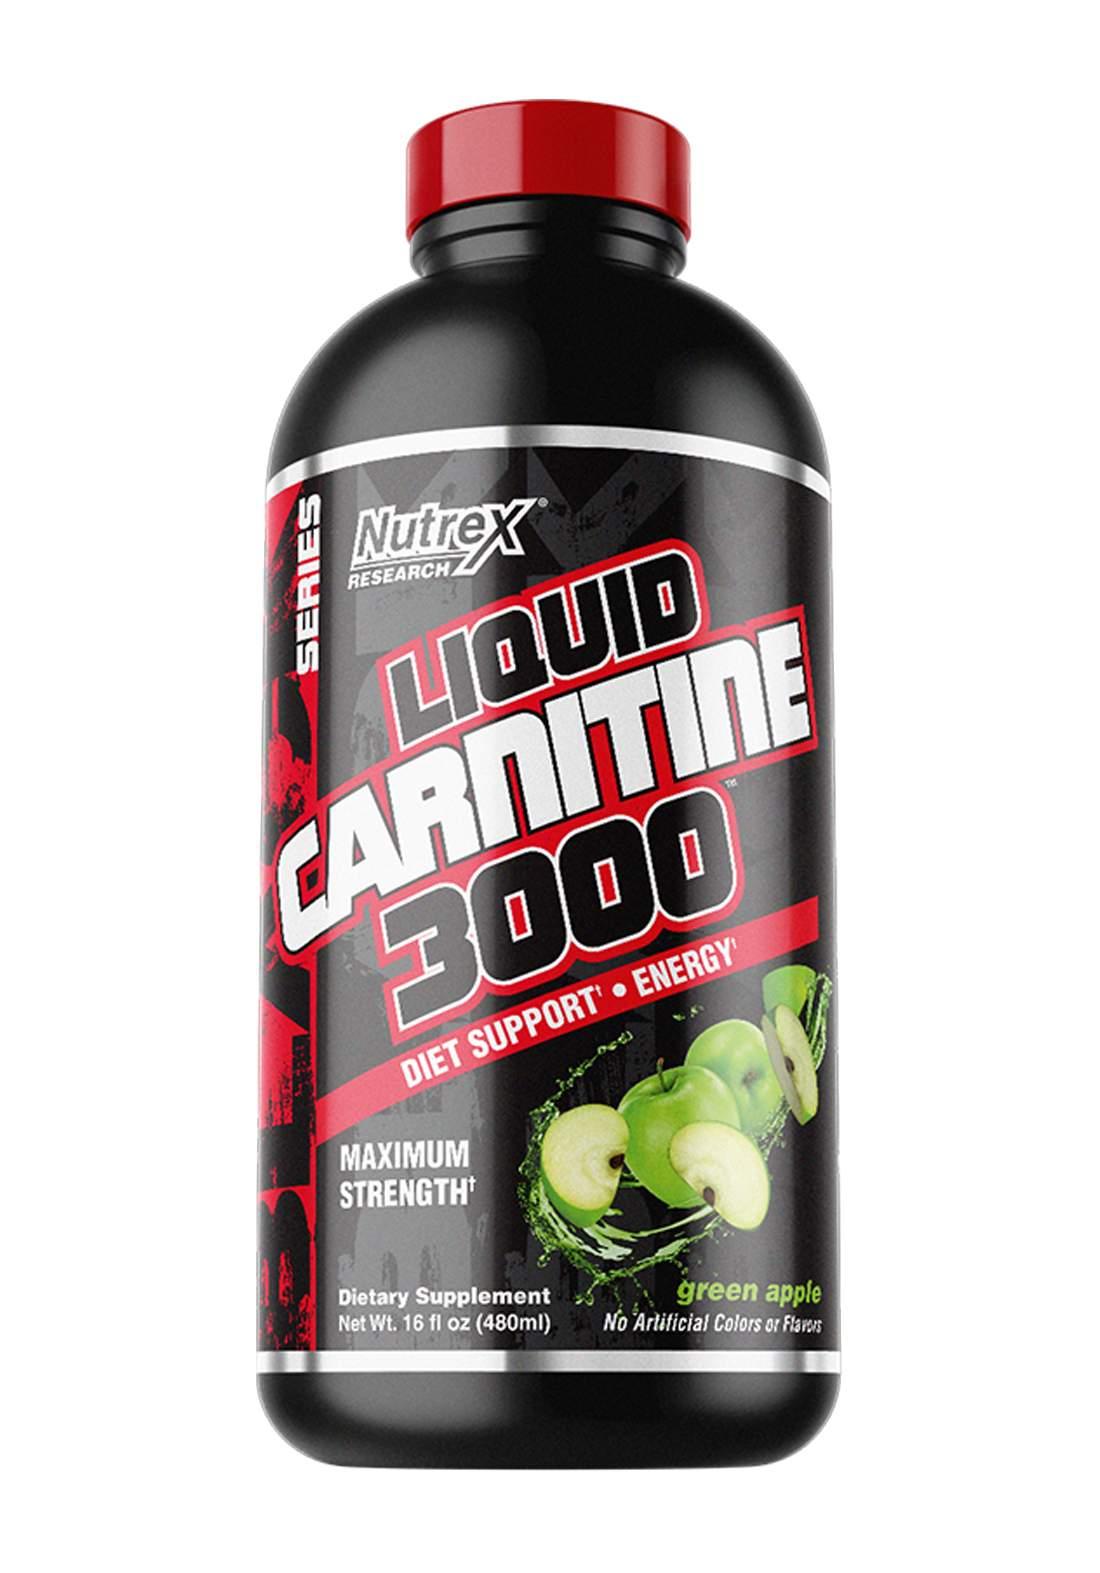 Nutrex Research Liquid Carnitine 3000 Diet Support Green Apple 480 ML مكمل غذائي لانقاص الوزن